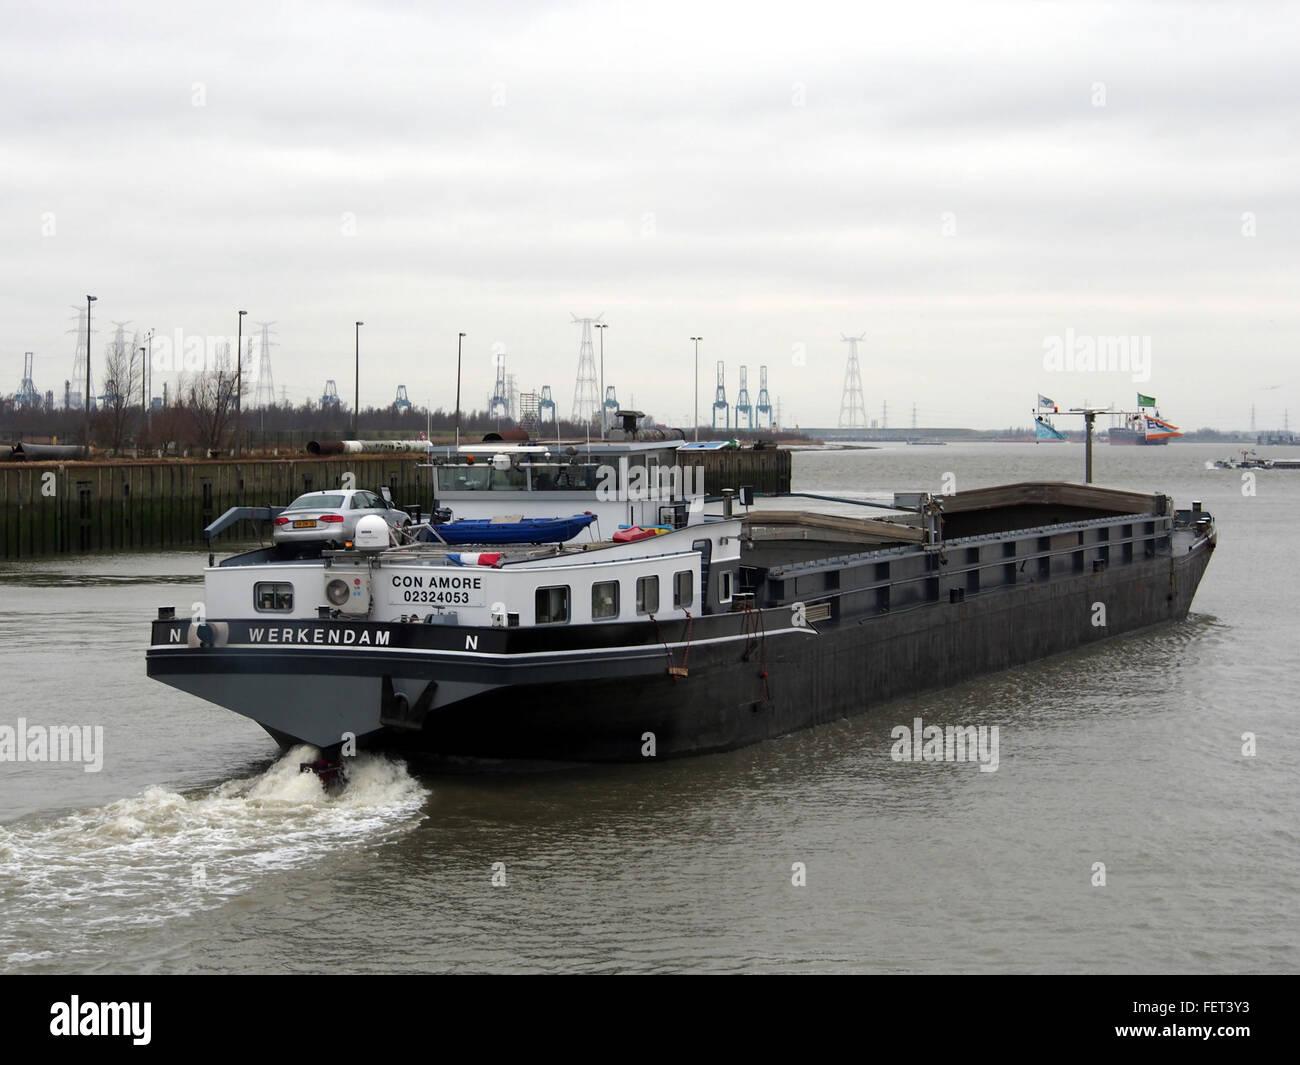 Con Amore (ship, 1956) ENI 02324053 Boudewijnsluis Port of Antwerp pic3 - Stock Image